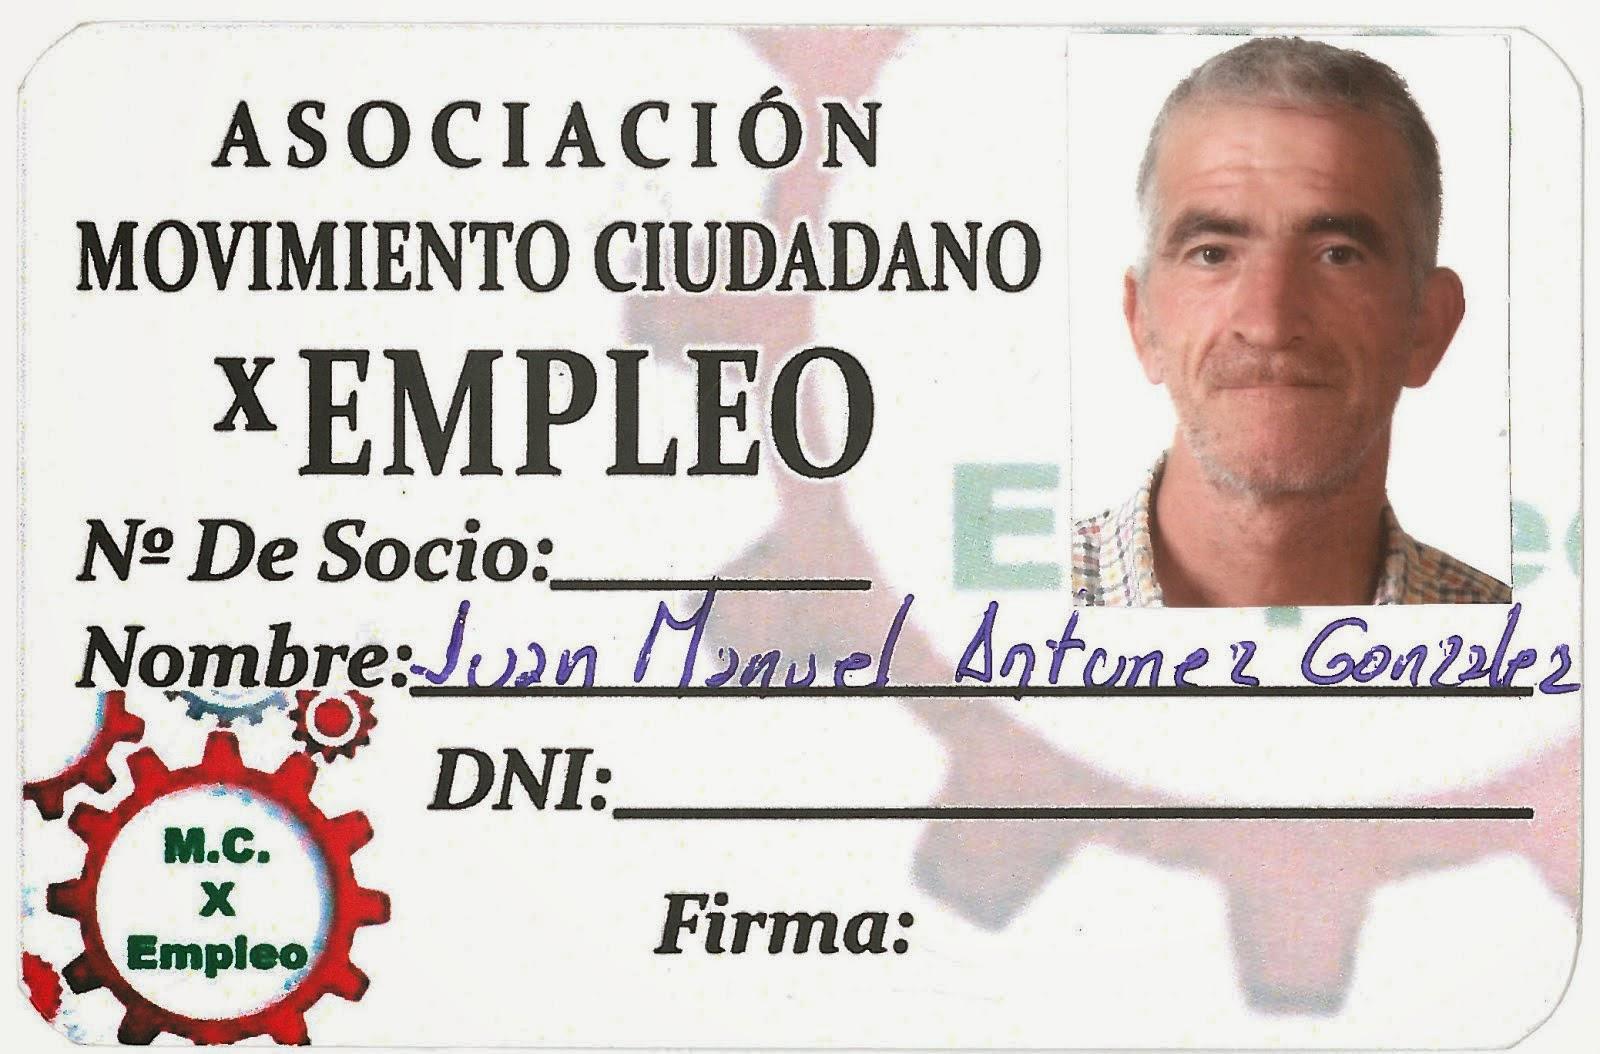 JUAN MANUEL ANTUNEZ GONZALEZ